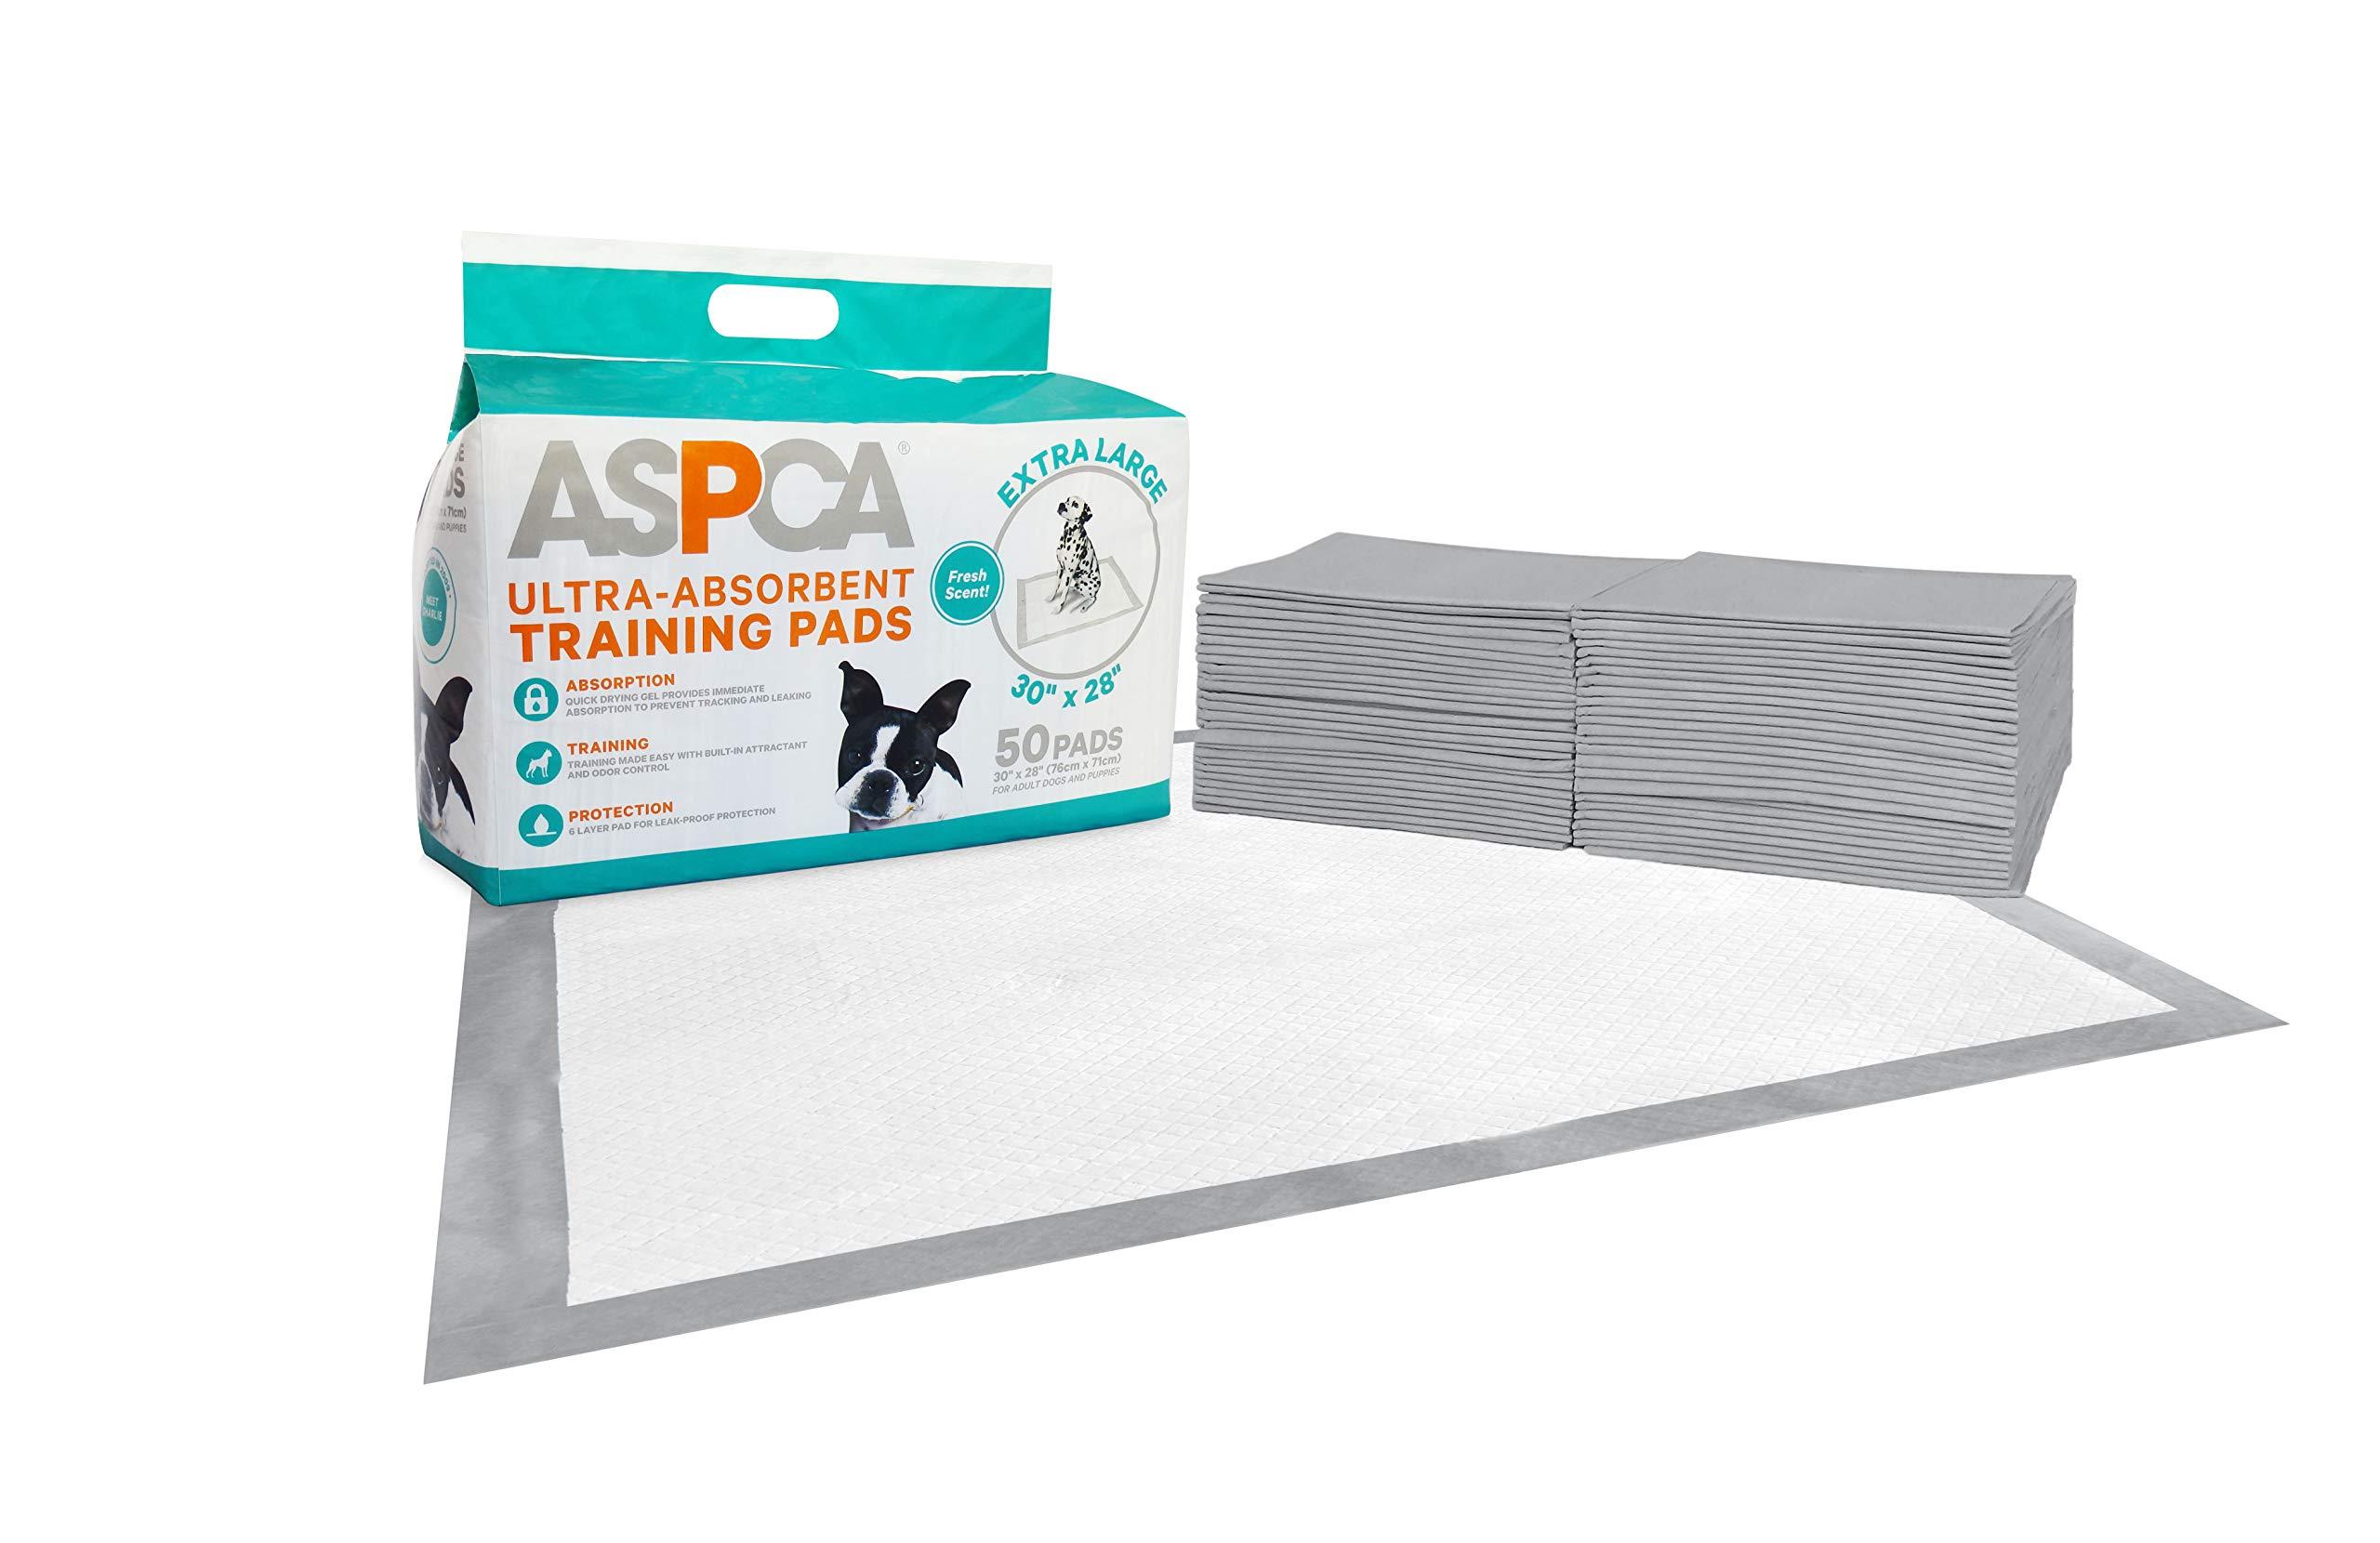 ASPCA Dog Training Pads (50 Pack), X-Large by ASPCA